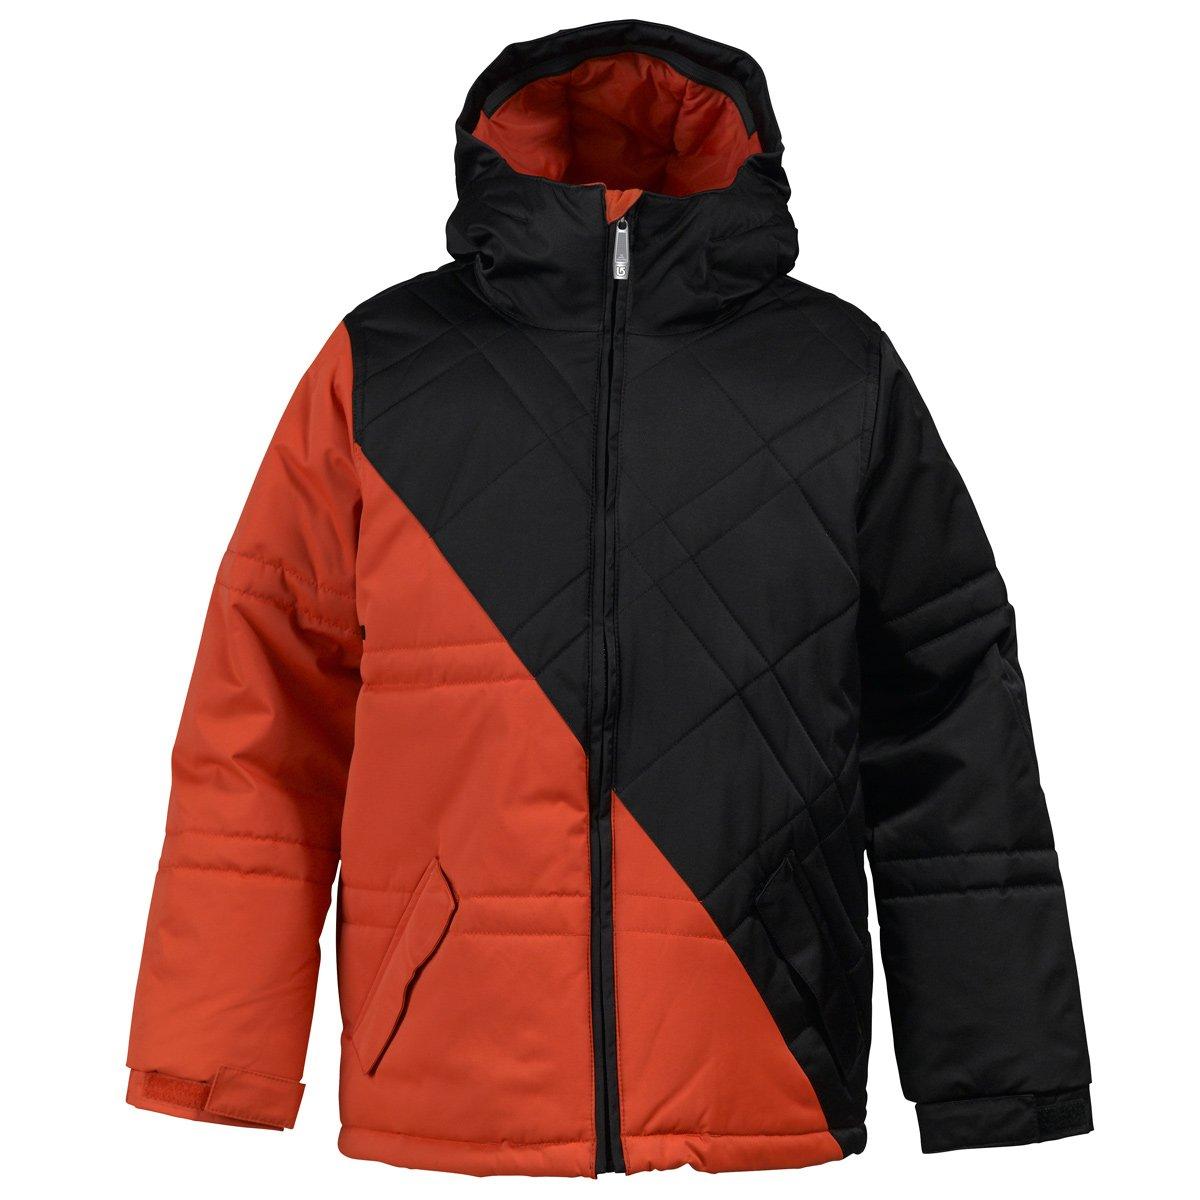 Kinder Snowboard Jacke Burton TWC Puffaluffagus Jacket youth günstig bestellen